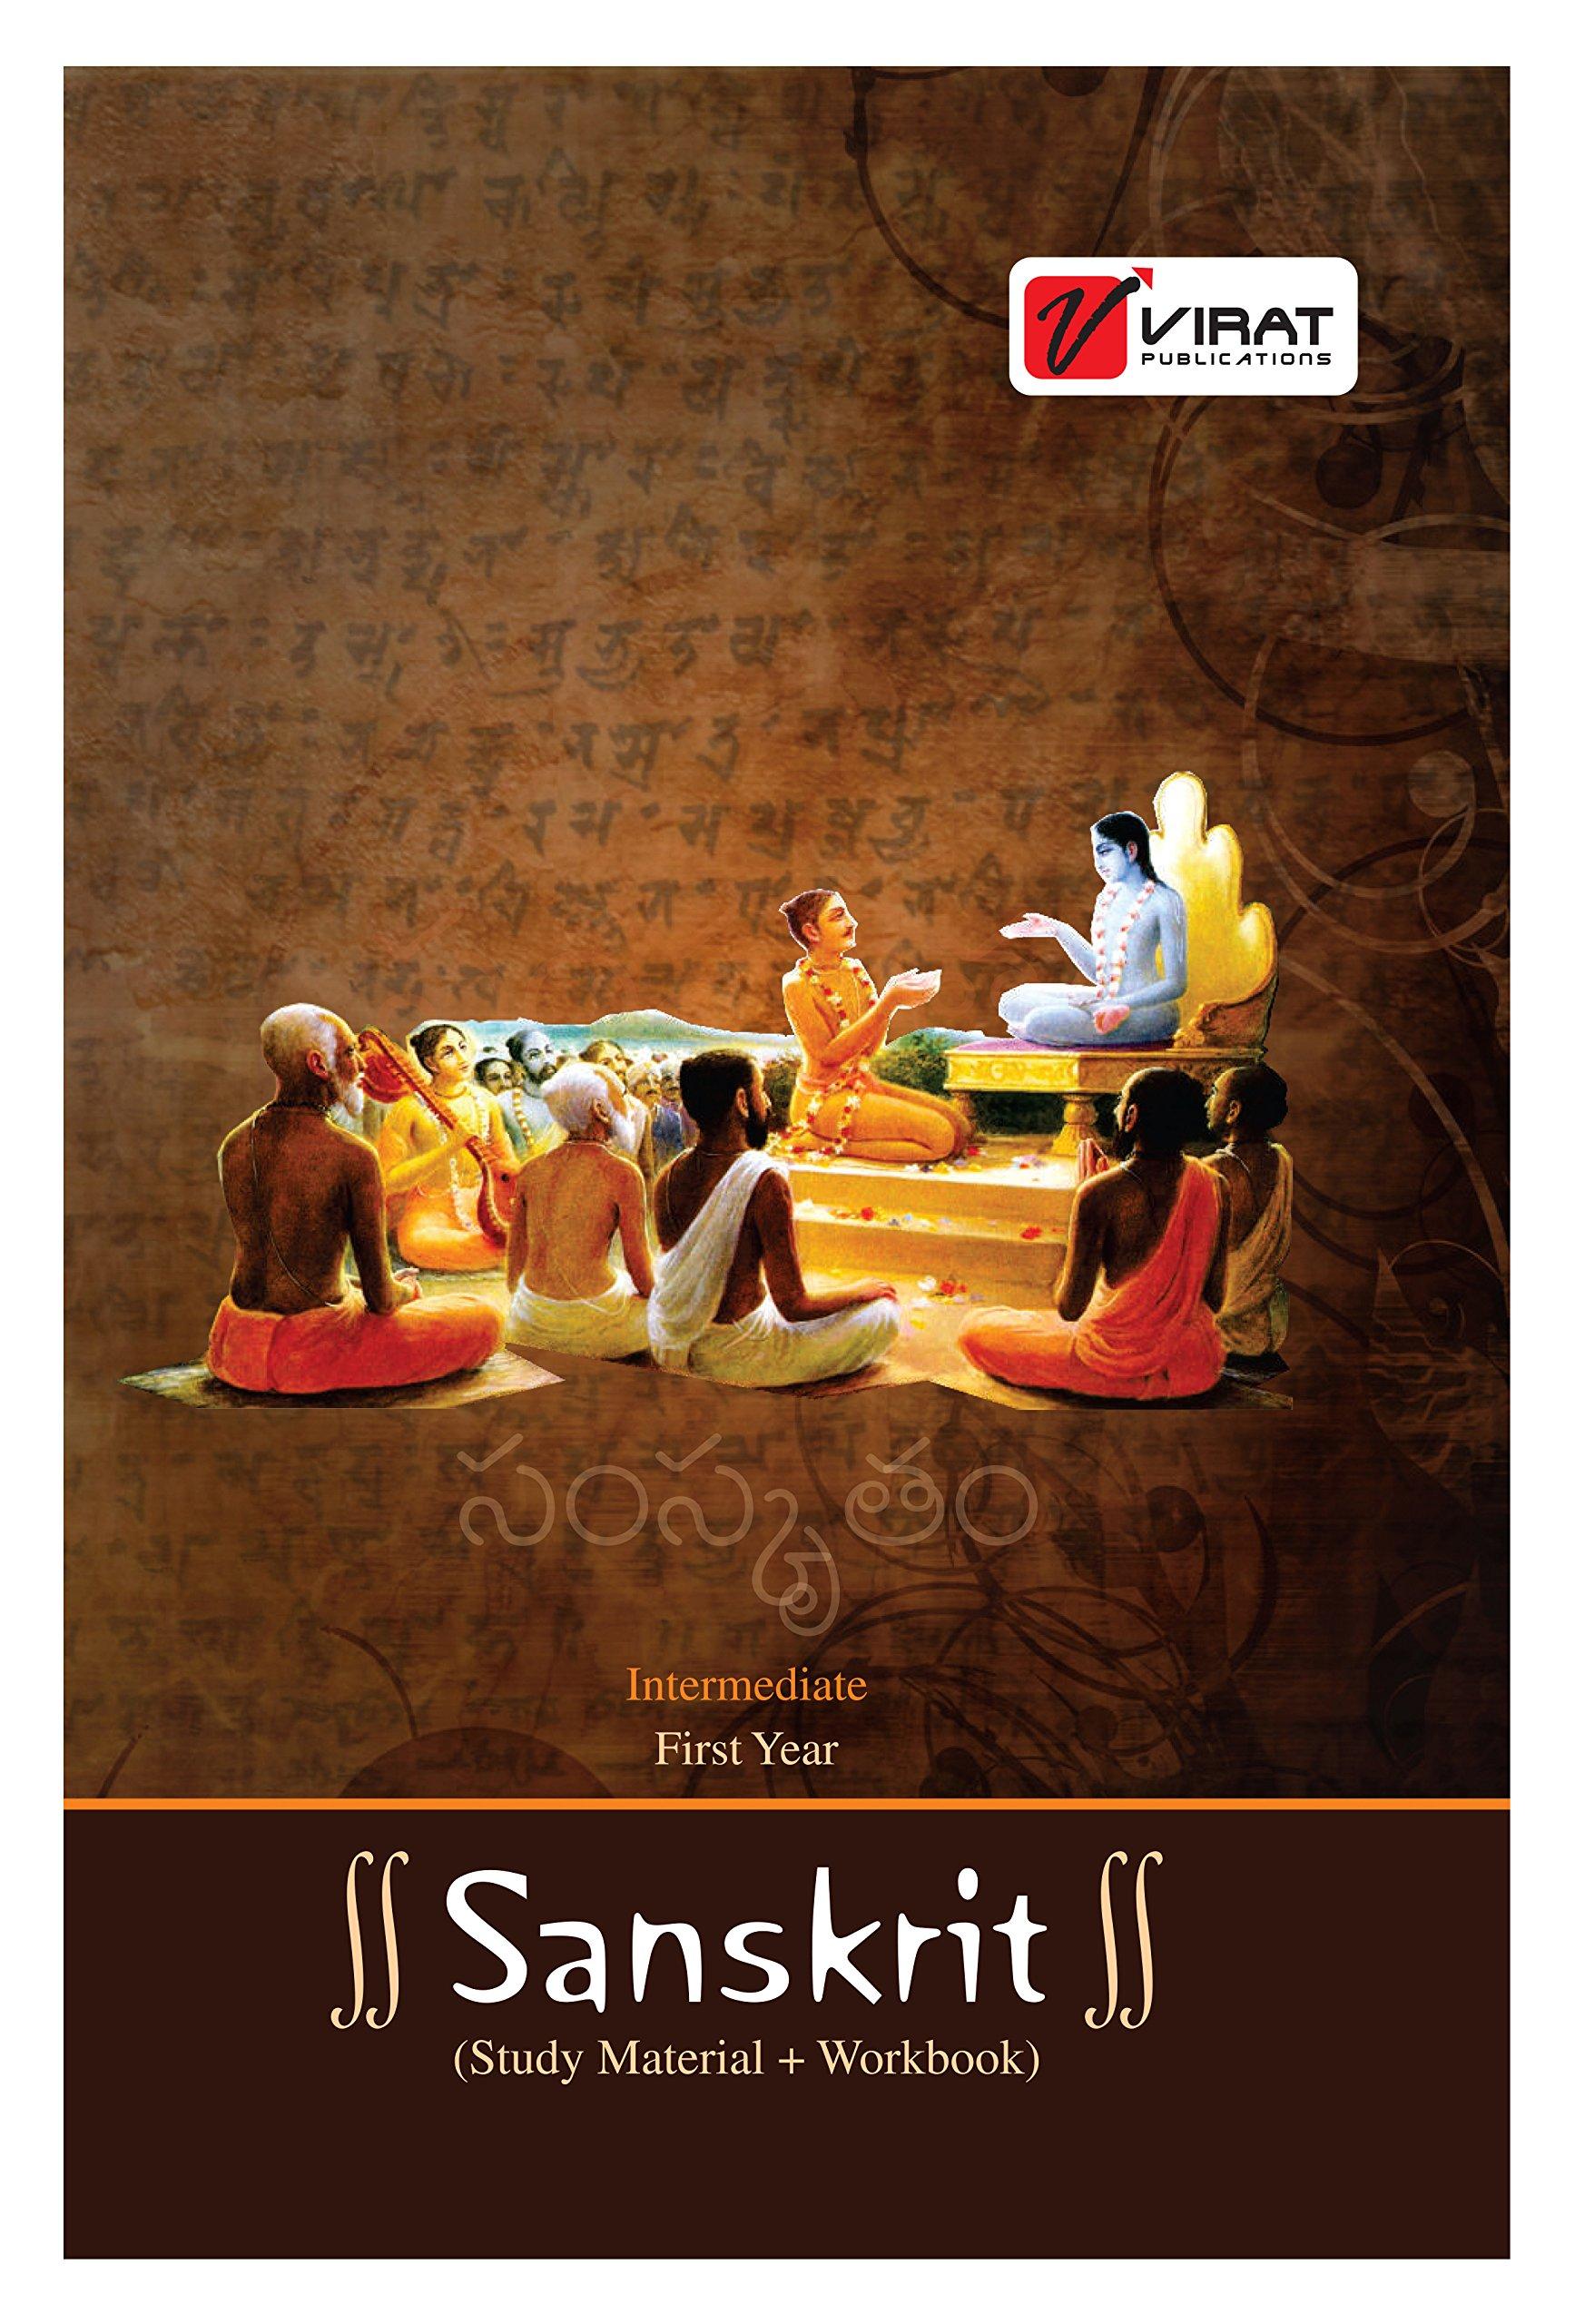 Buy Telugu Academy Sanskrit Study Material and Workbook for